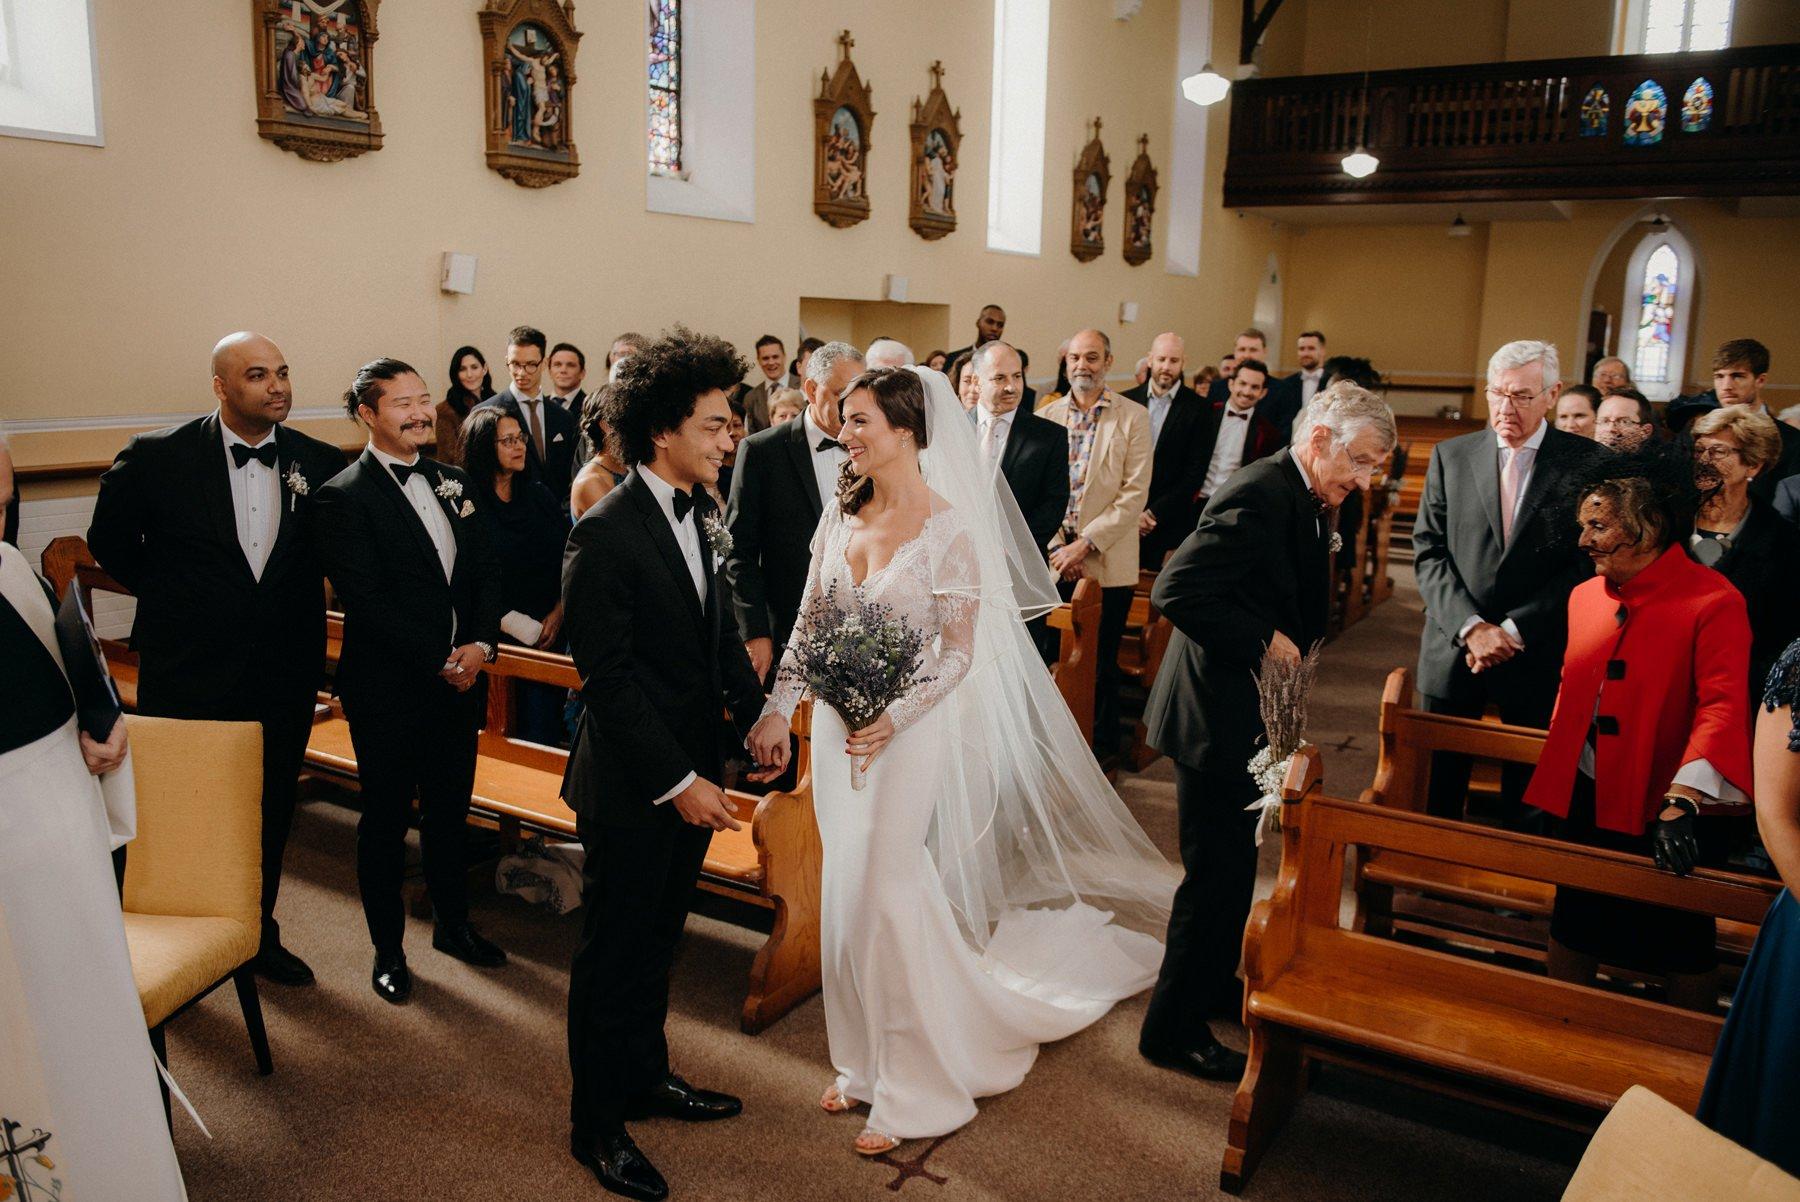 virginia-park-lodge-wedding-church-ceremony